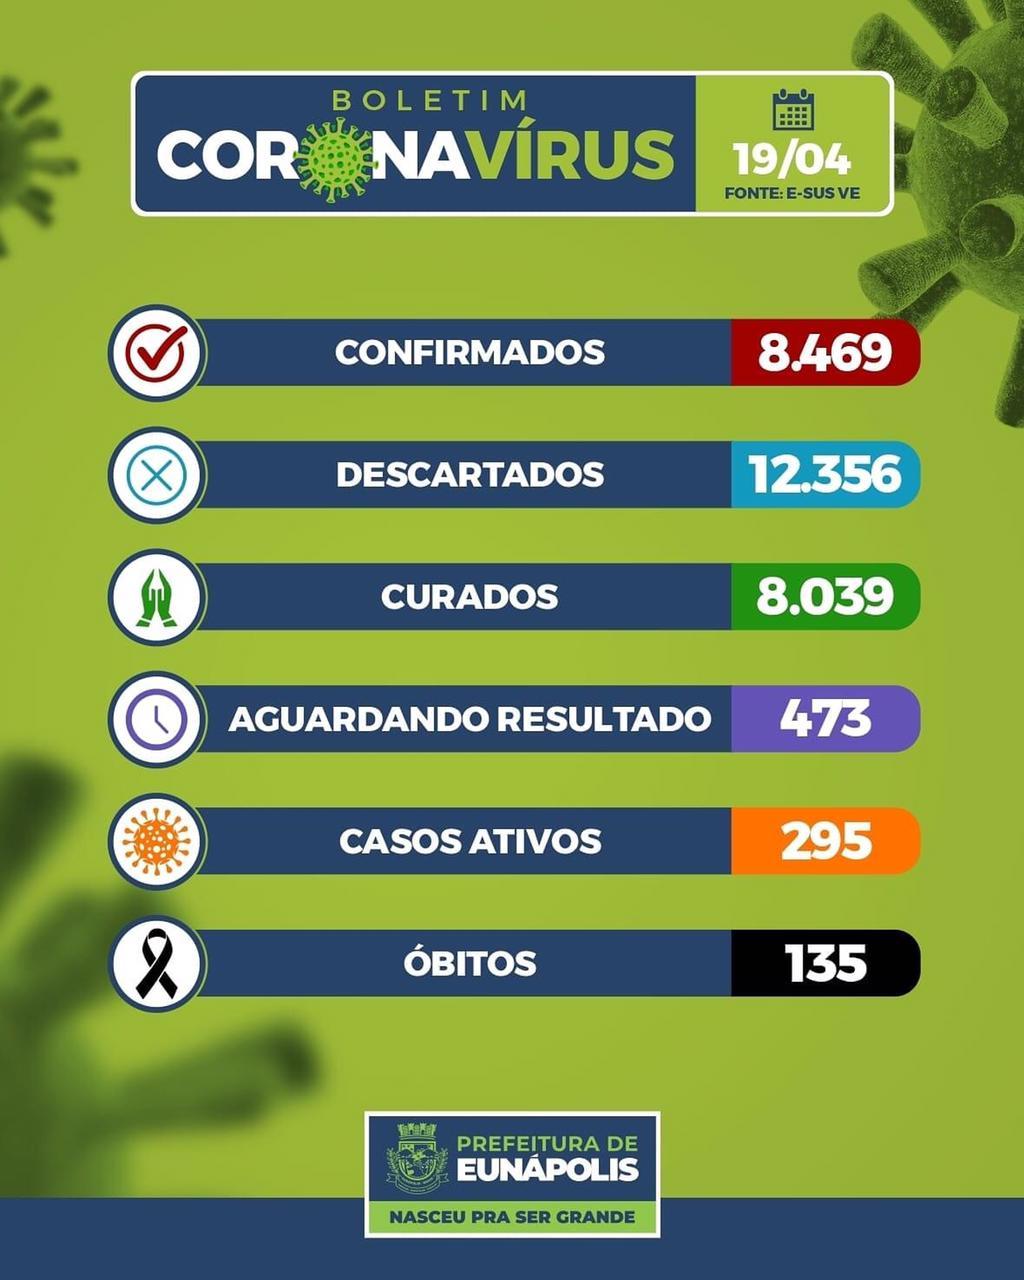 Boletim Epidemiológico Coronavírus do Município de Eunápolis para a data de hoje, 19/04/2021. 23